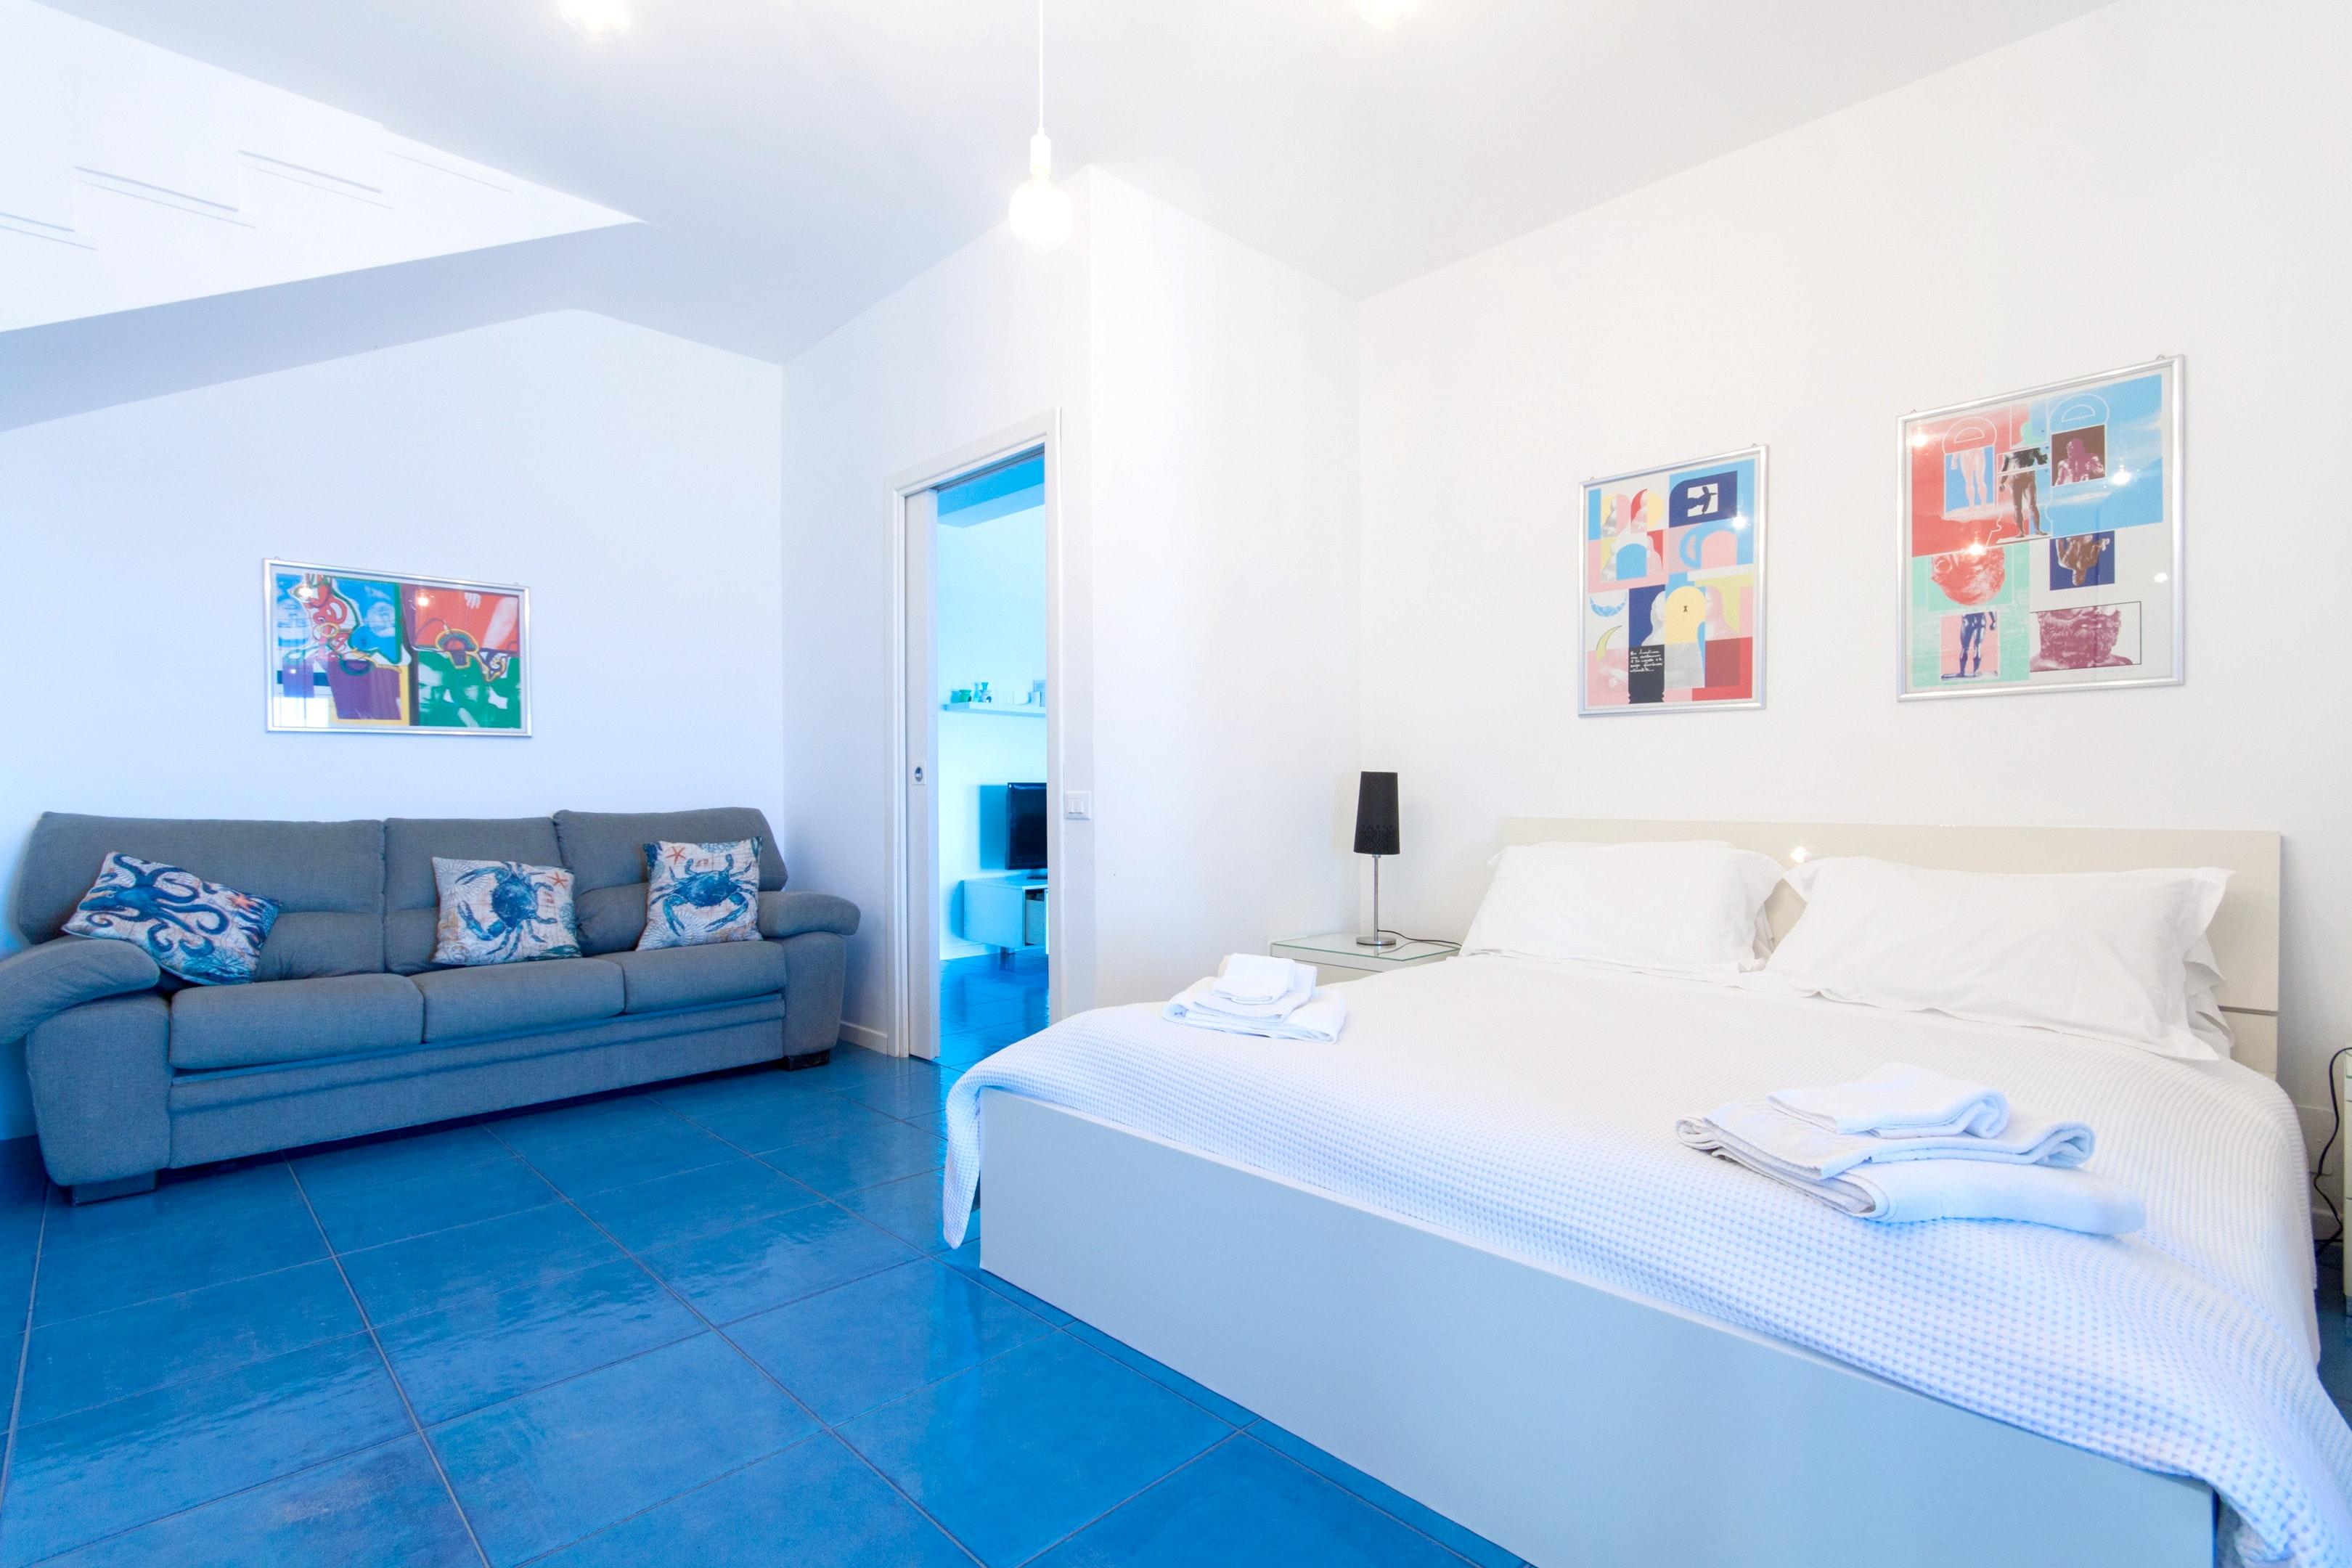 Holiday apartment Wohnung mit 4 Schlafzimmern in Piano di Trappeto mit herrlichem Meerblick, möblierter Terr (2236750), Balestrate, Palermo, Sicily, Italy, picture 14